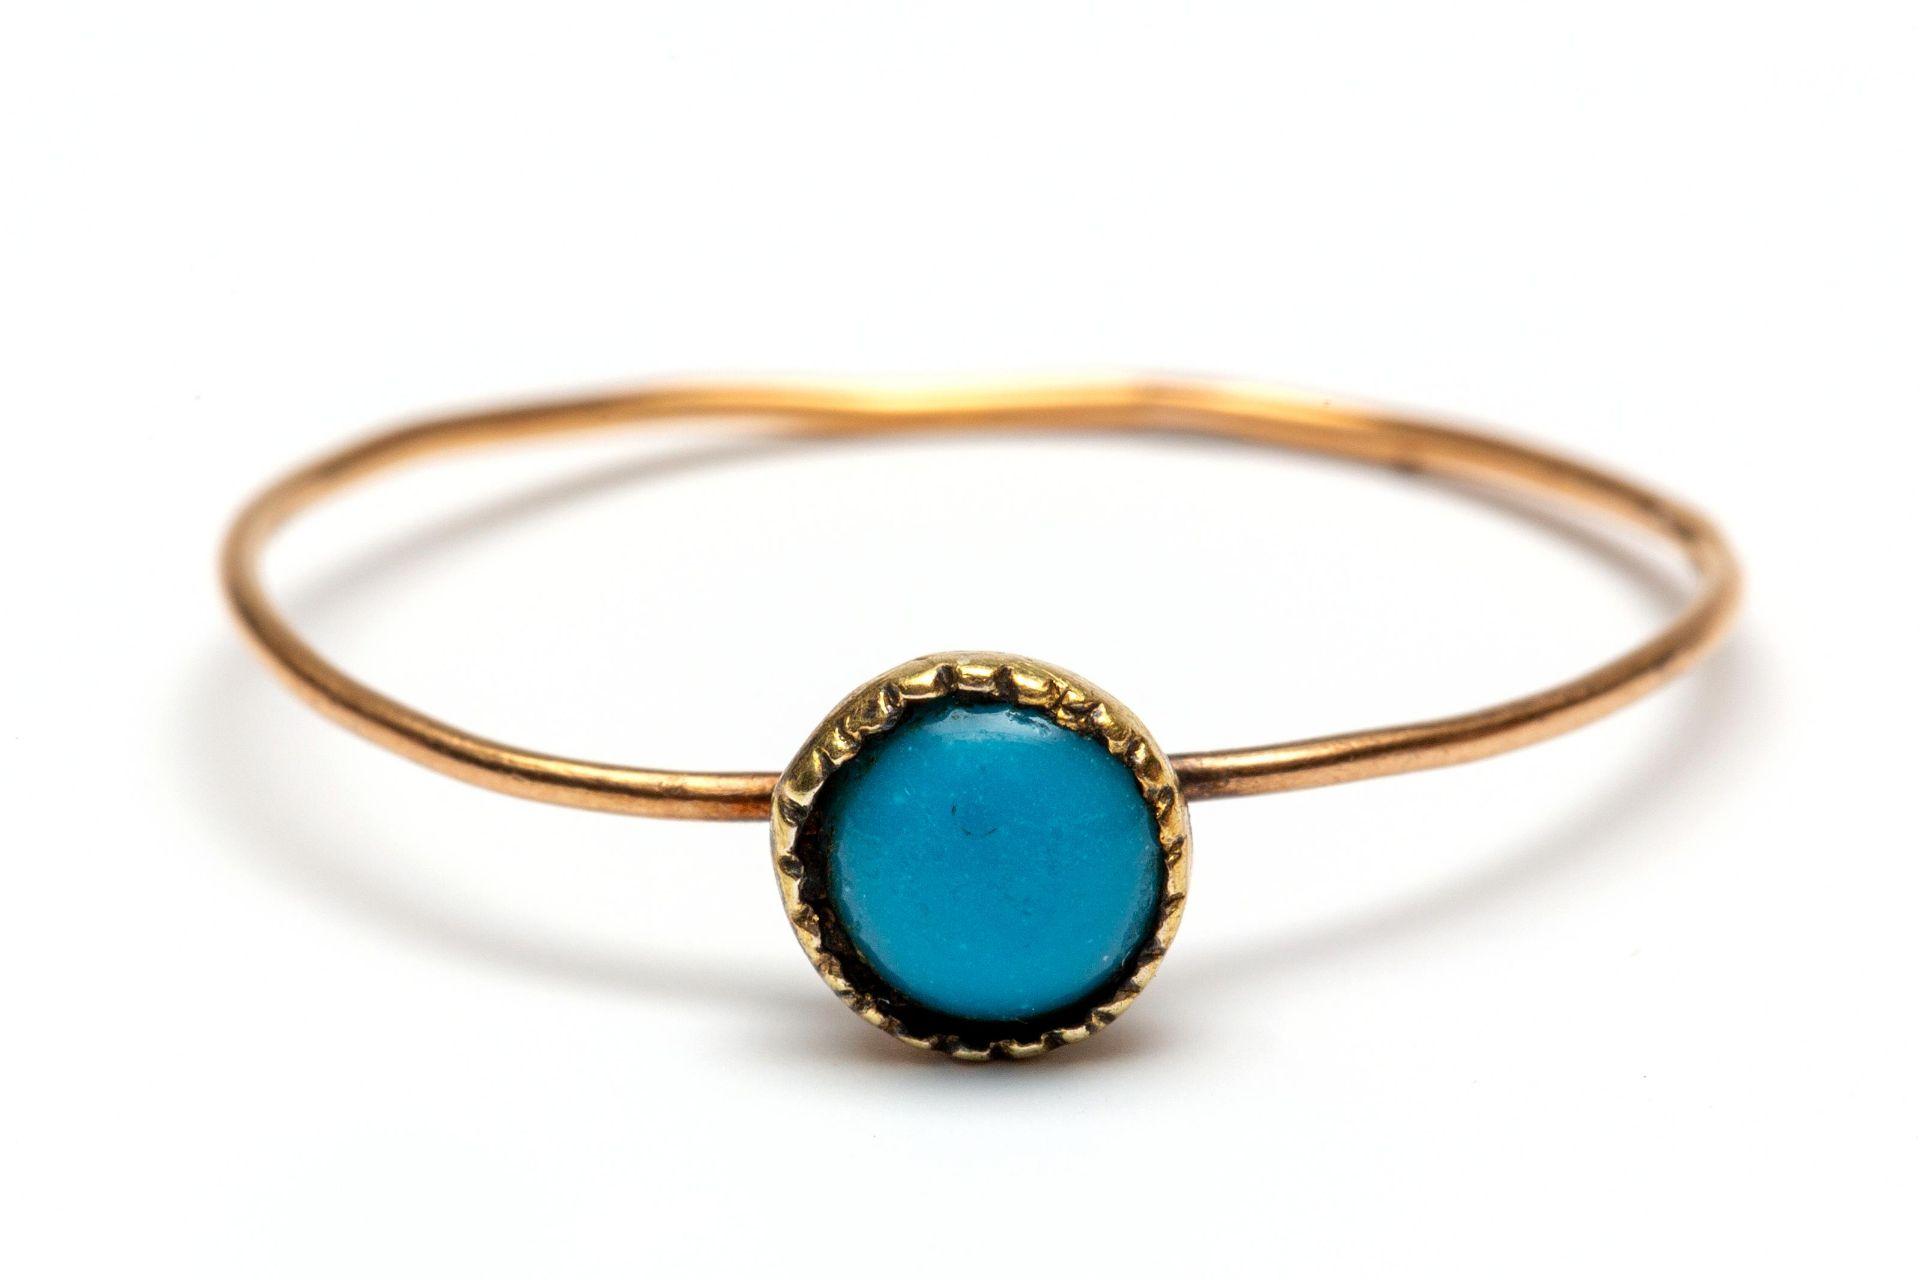 18krt. Gouden ring, rond 1800,